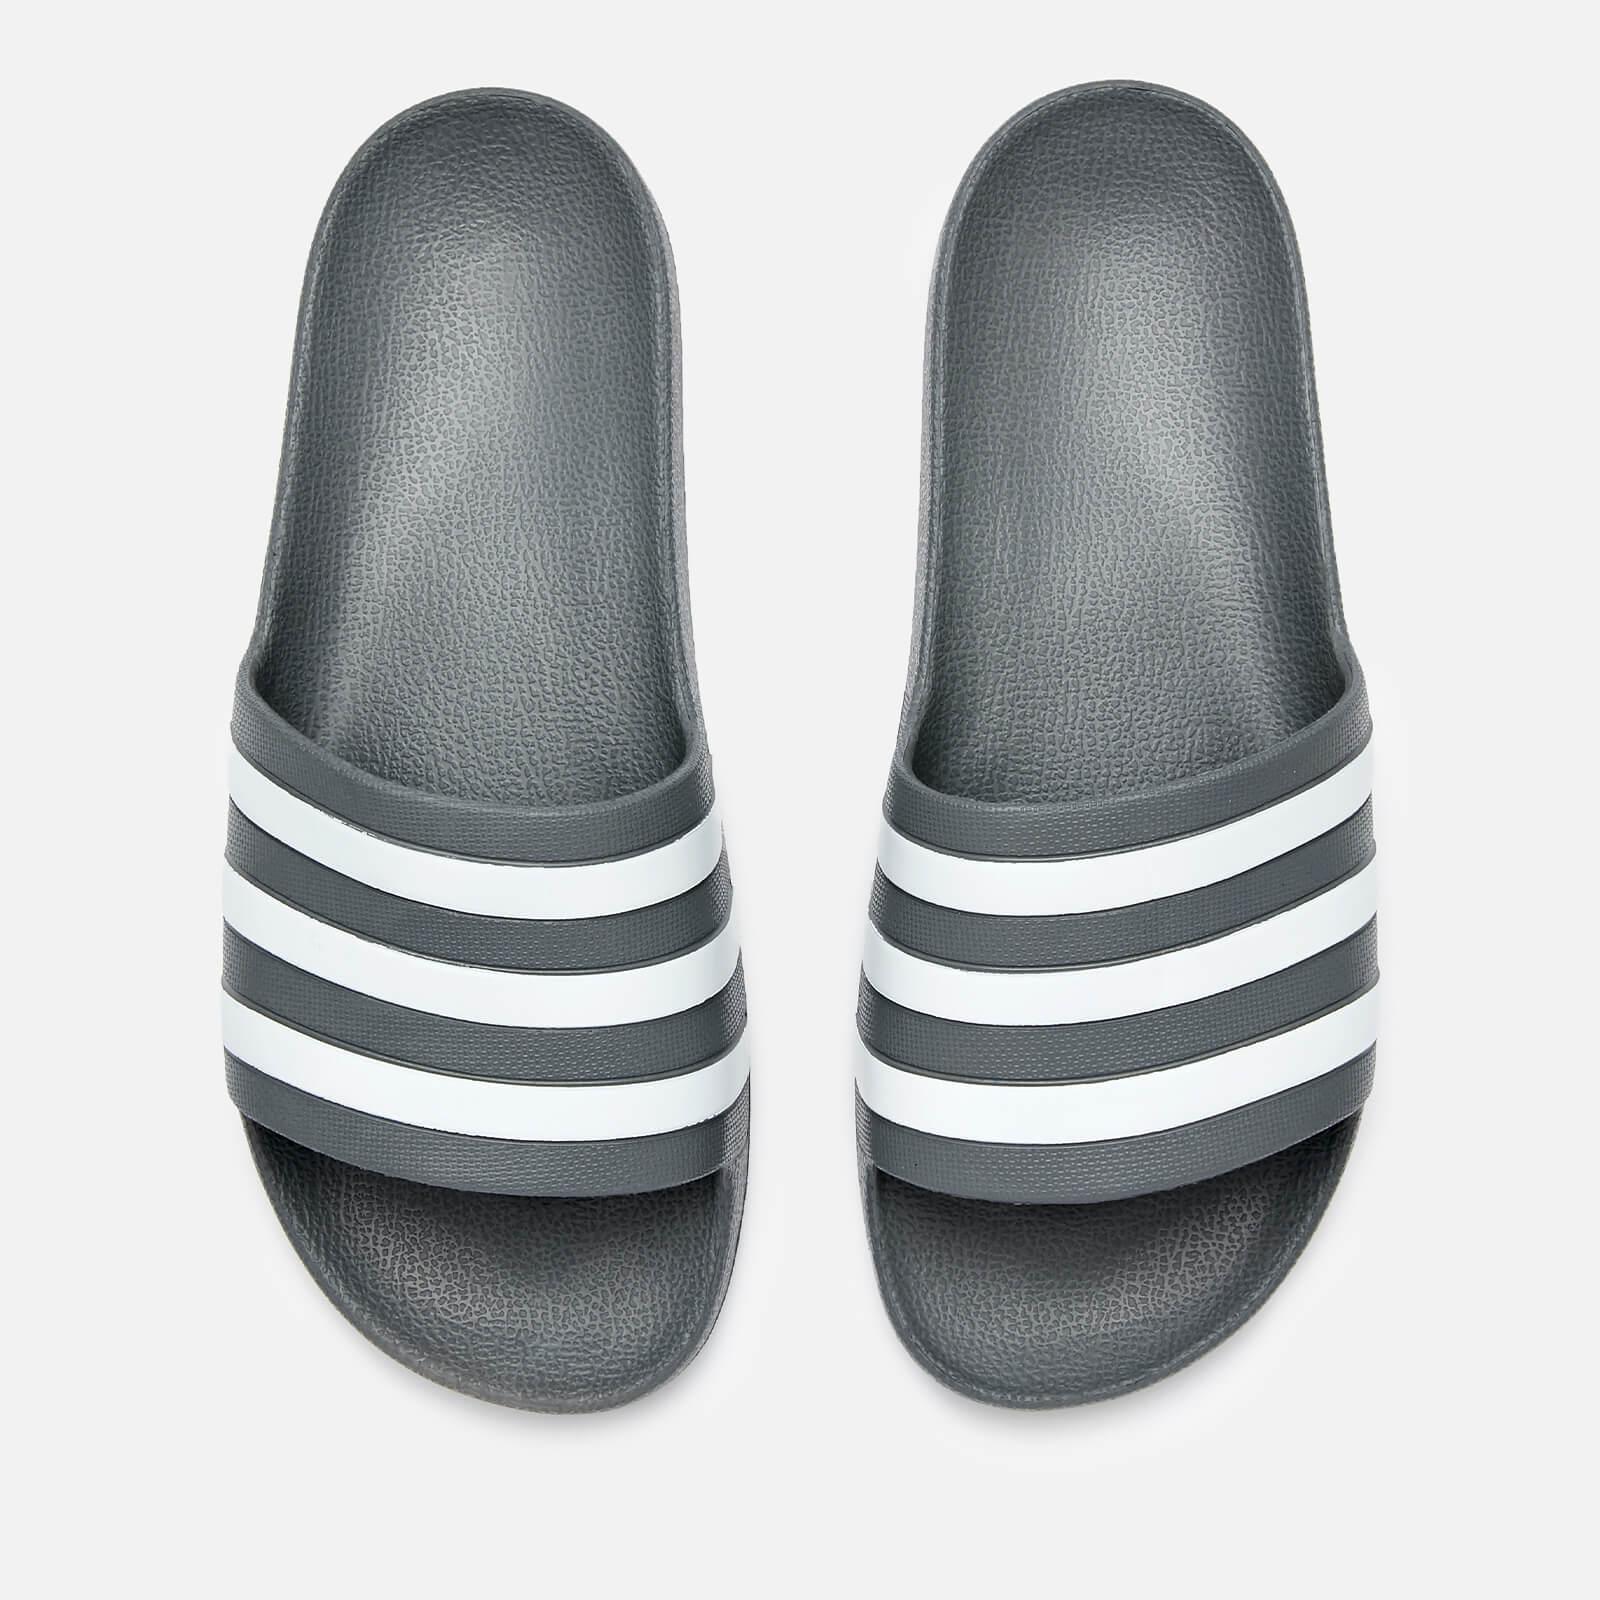 adidas Men's Adilette Aqua Slide Sandals - Grey Three - UK 10 - Grey